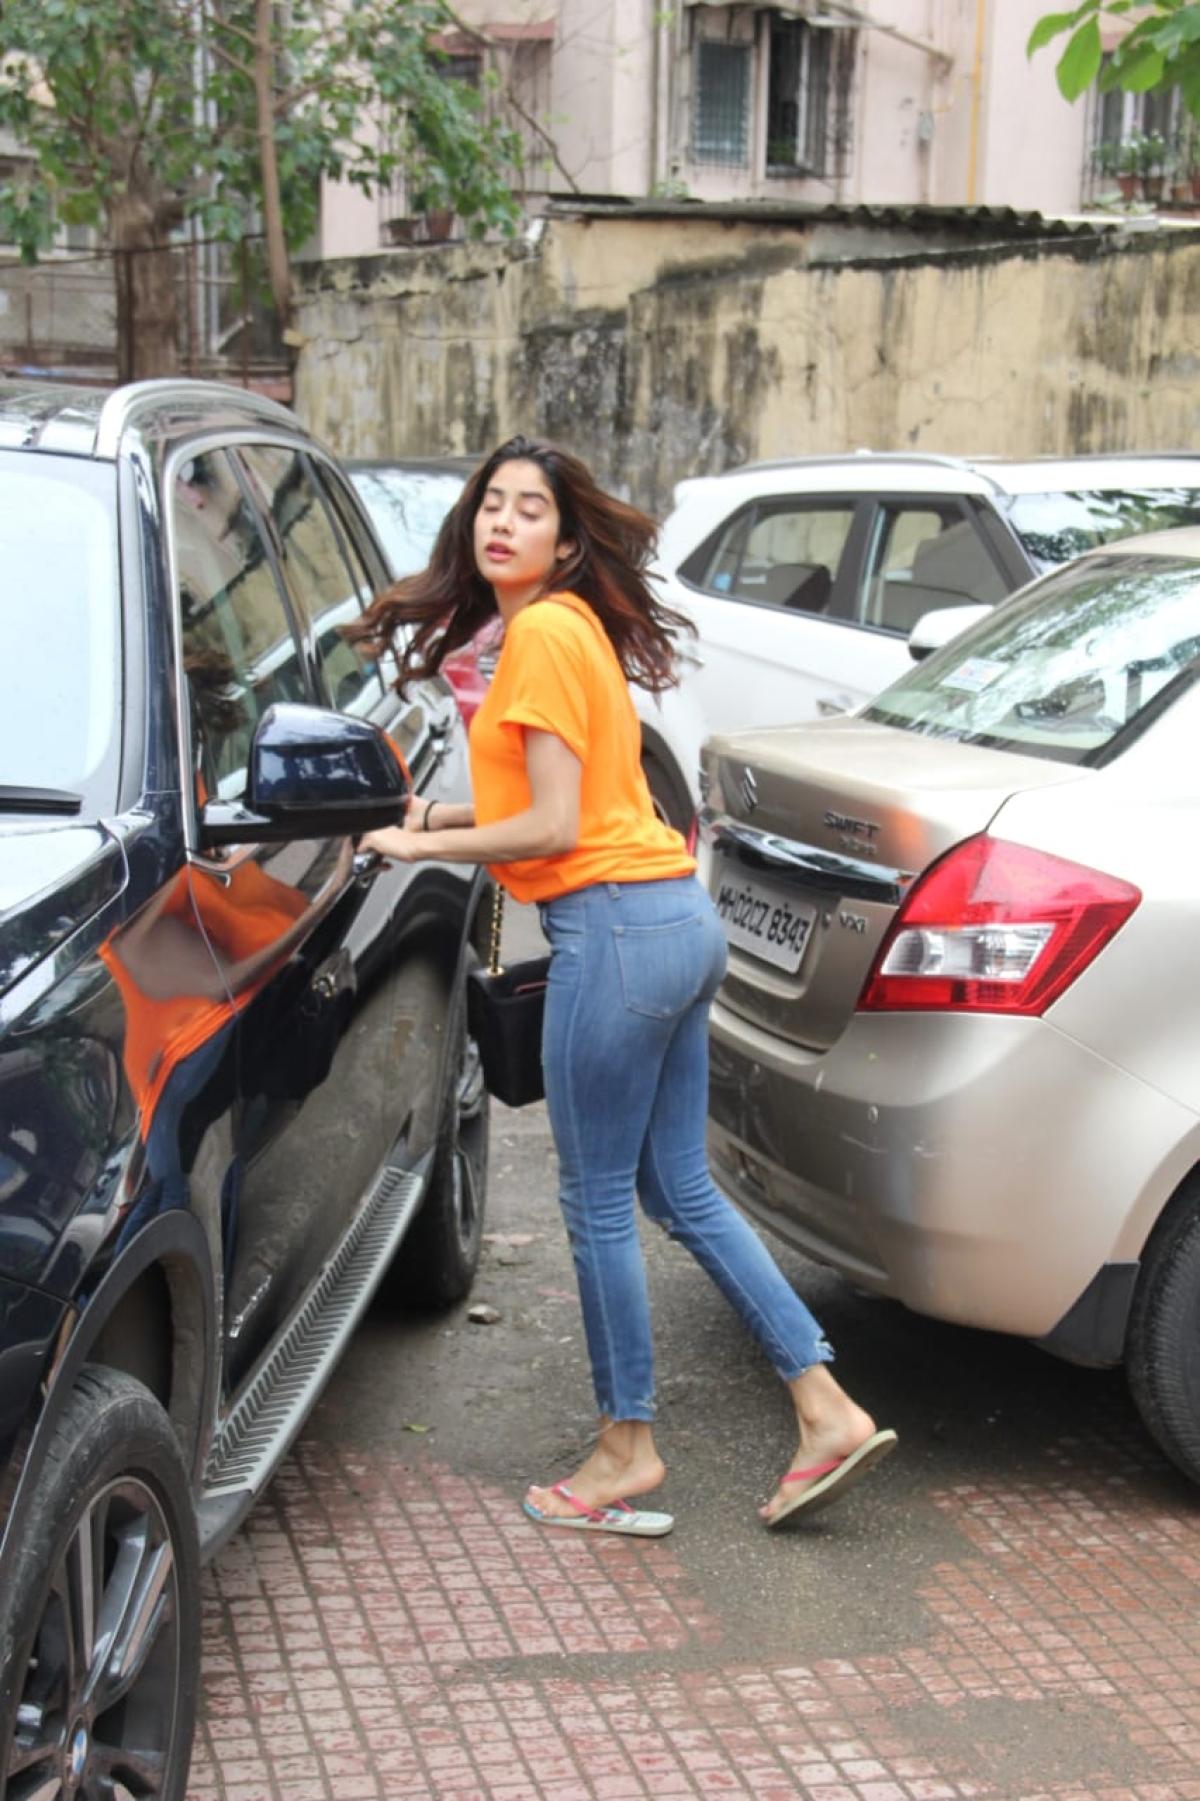 Celebrity spotting: From Mira Kapoor's gym look to Jhanvi Kapoor's casuals and Kriti Sanon's Desi avatar